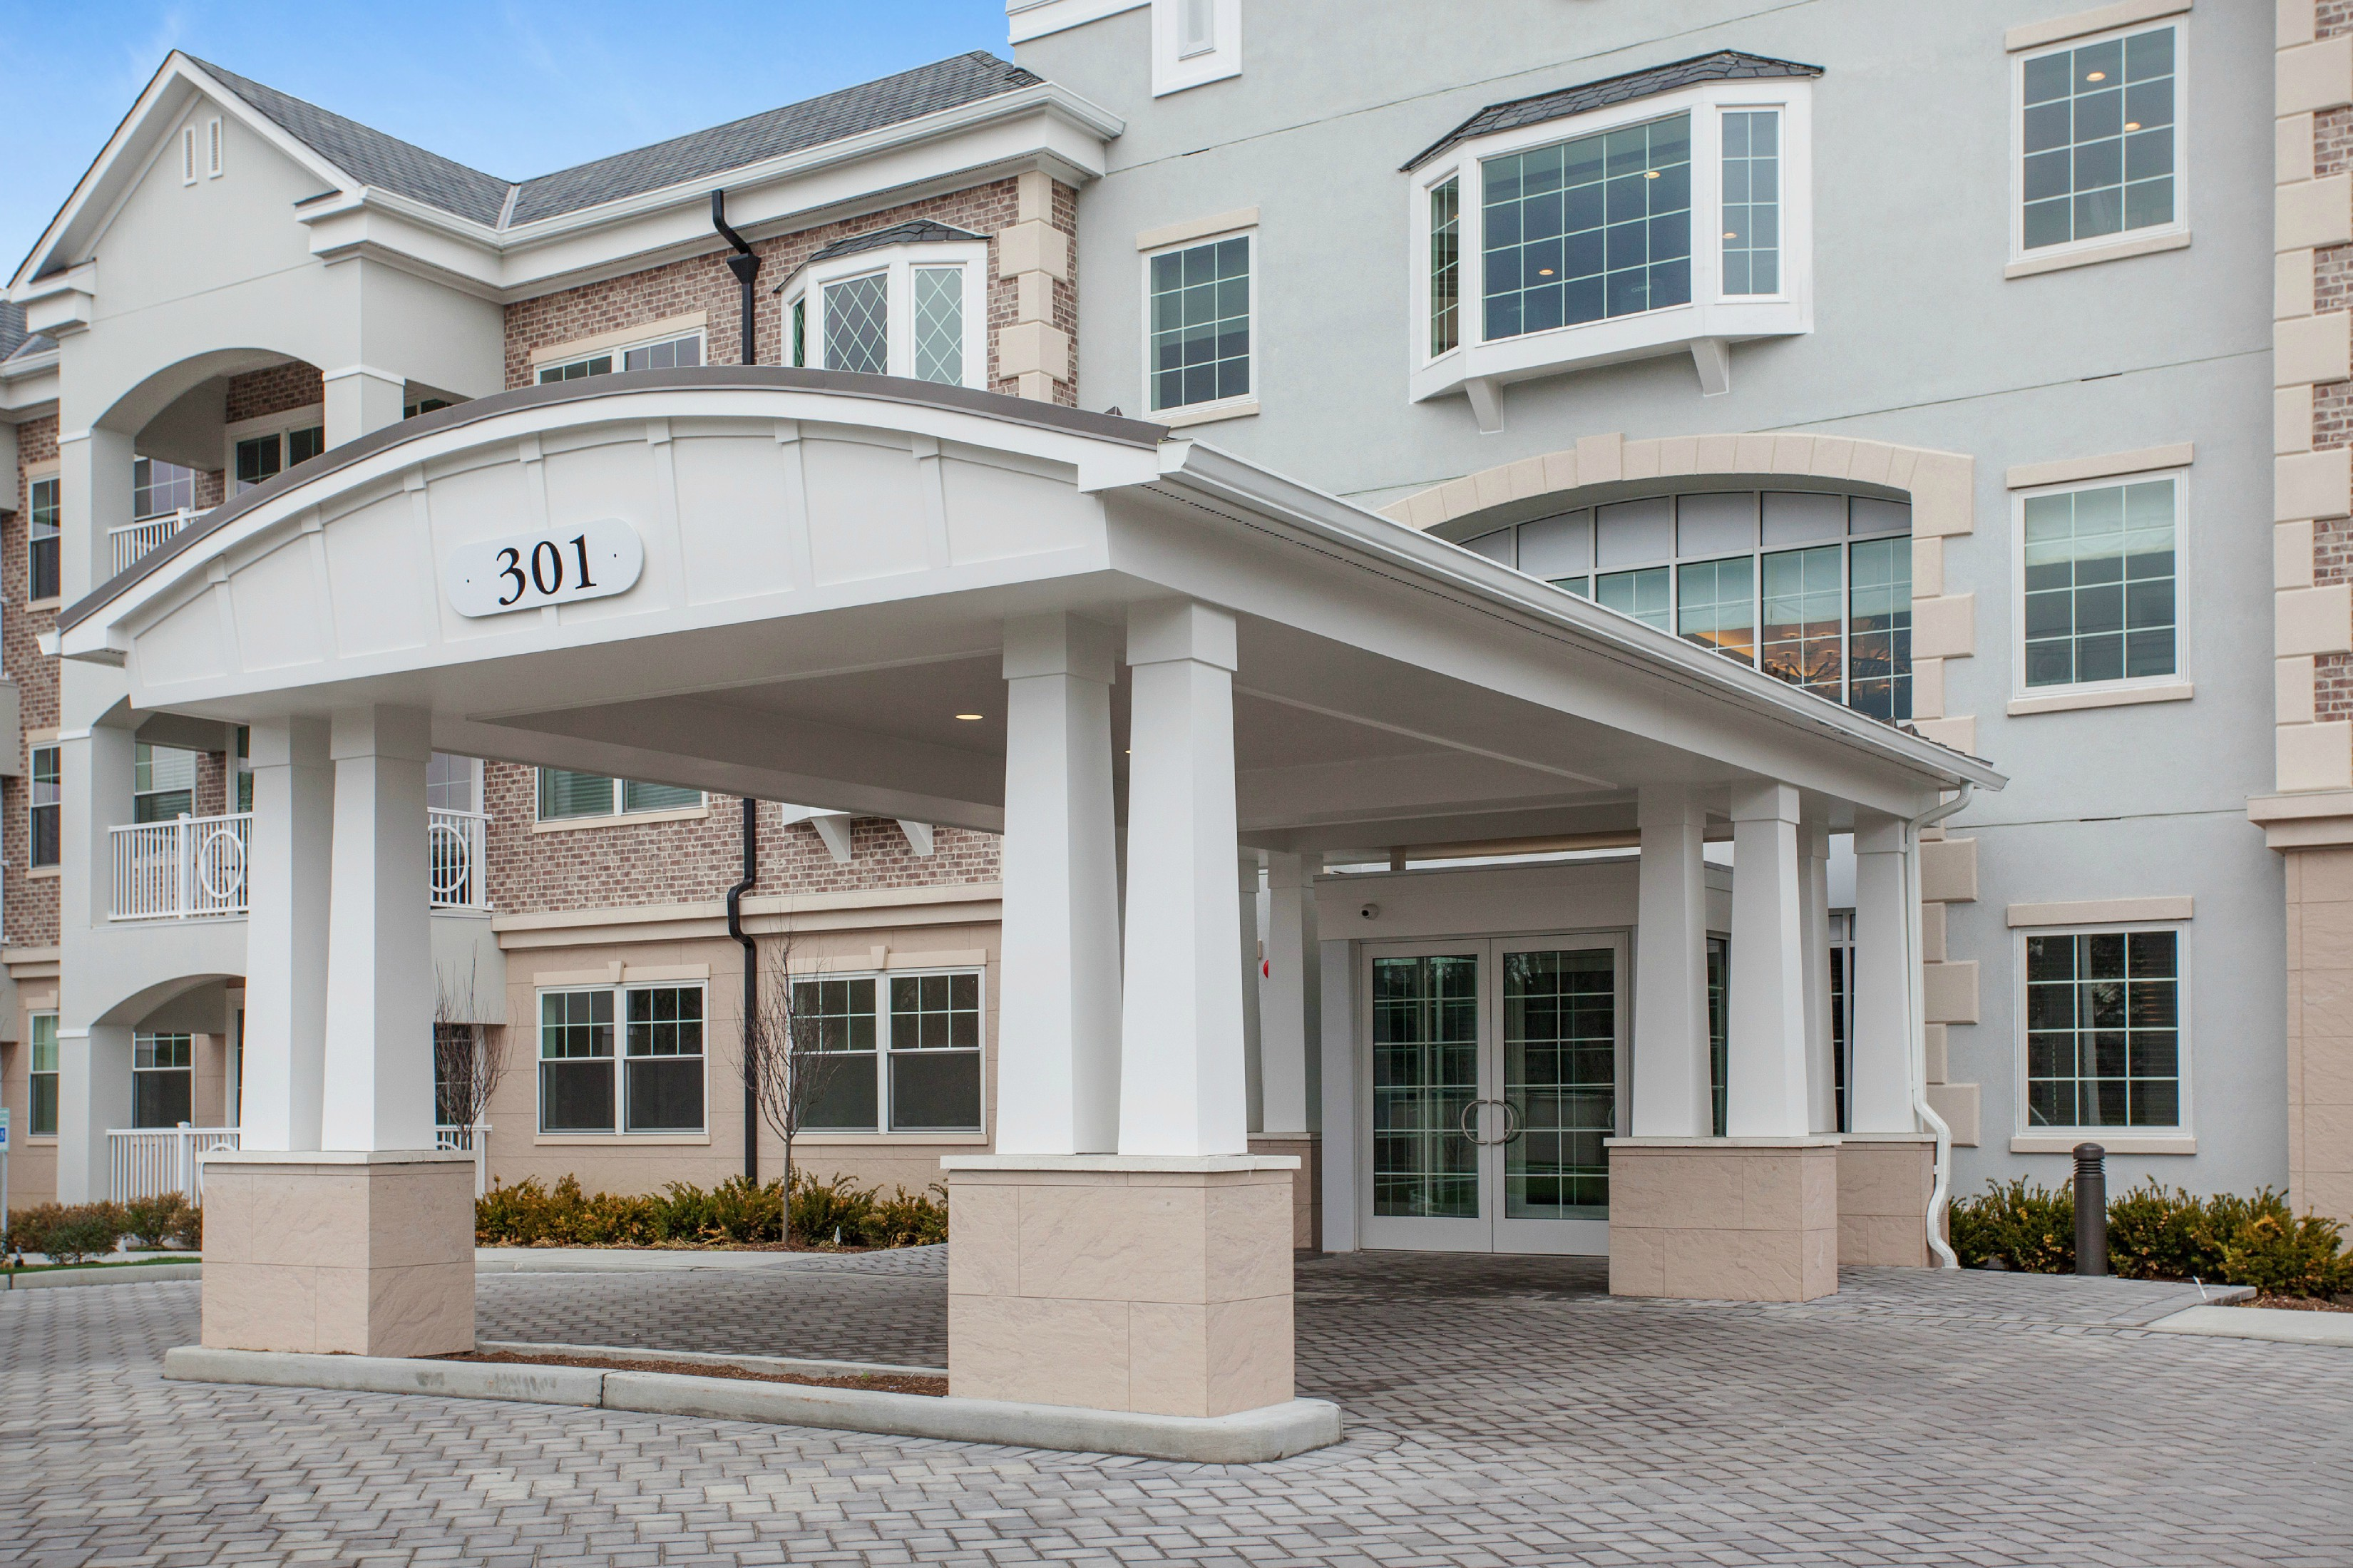 Condominium for Sale at Condo 301 Franklin Ave 2 202 Garden City, New York, 11530 United States